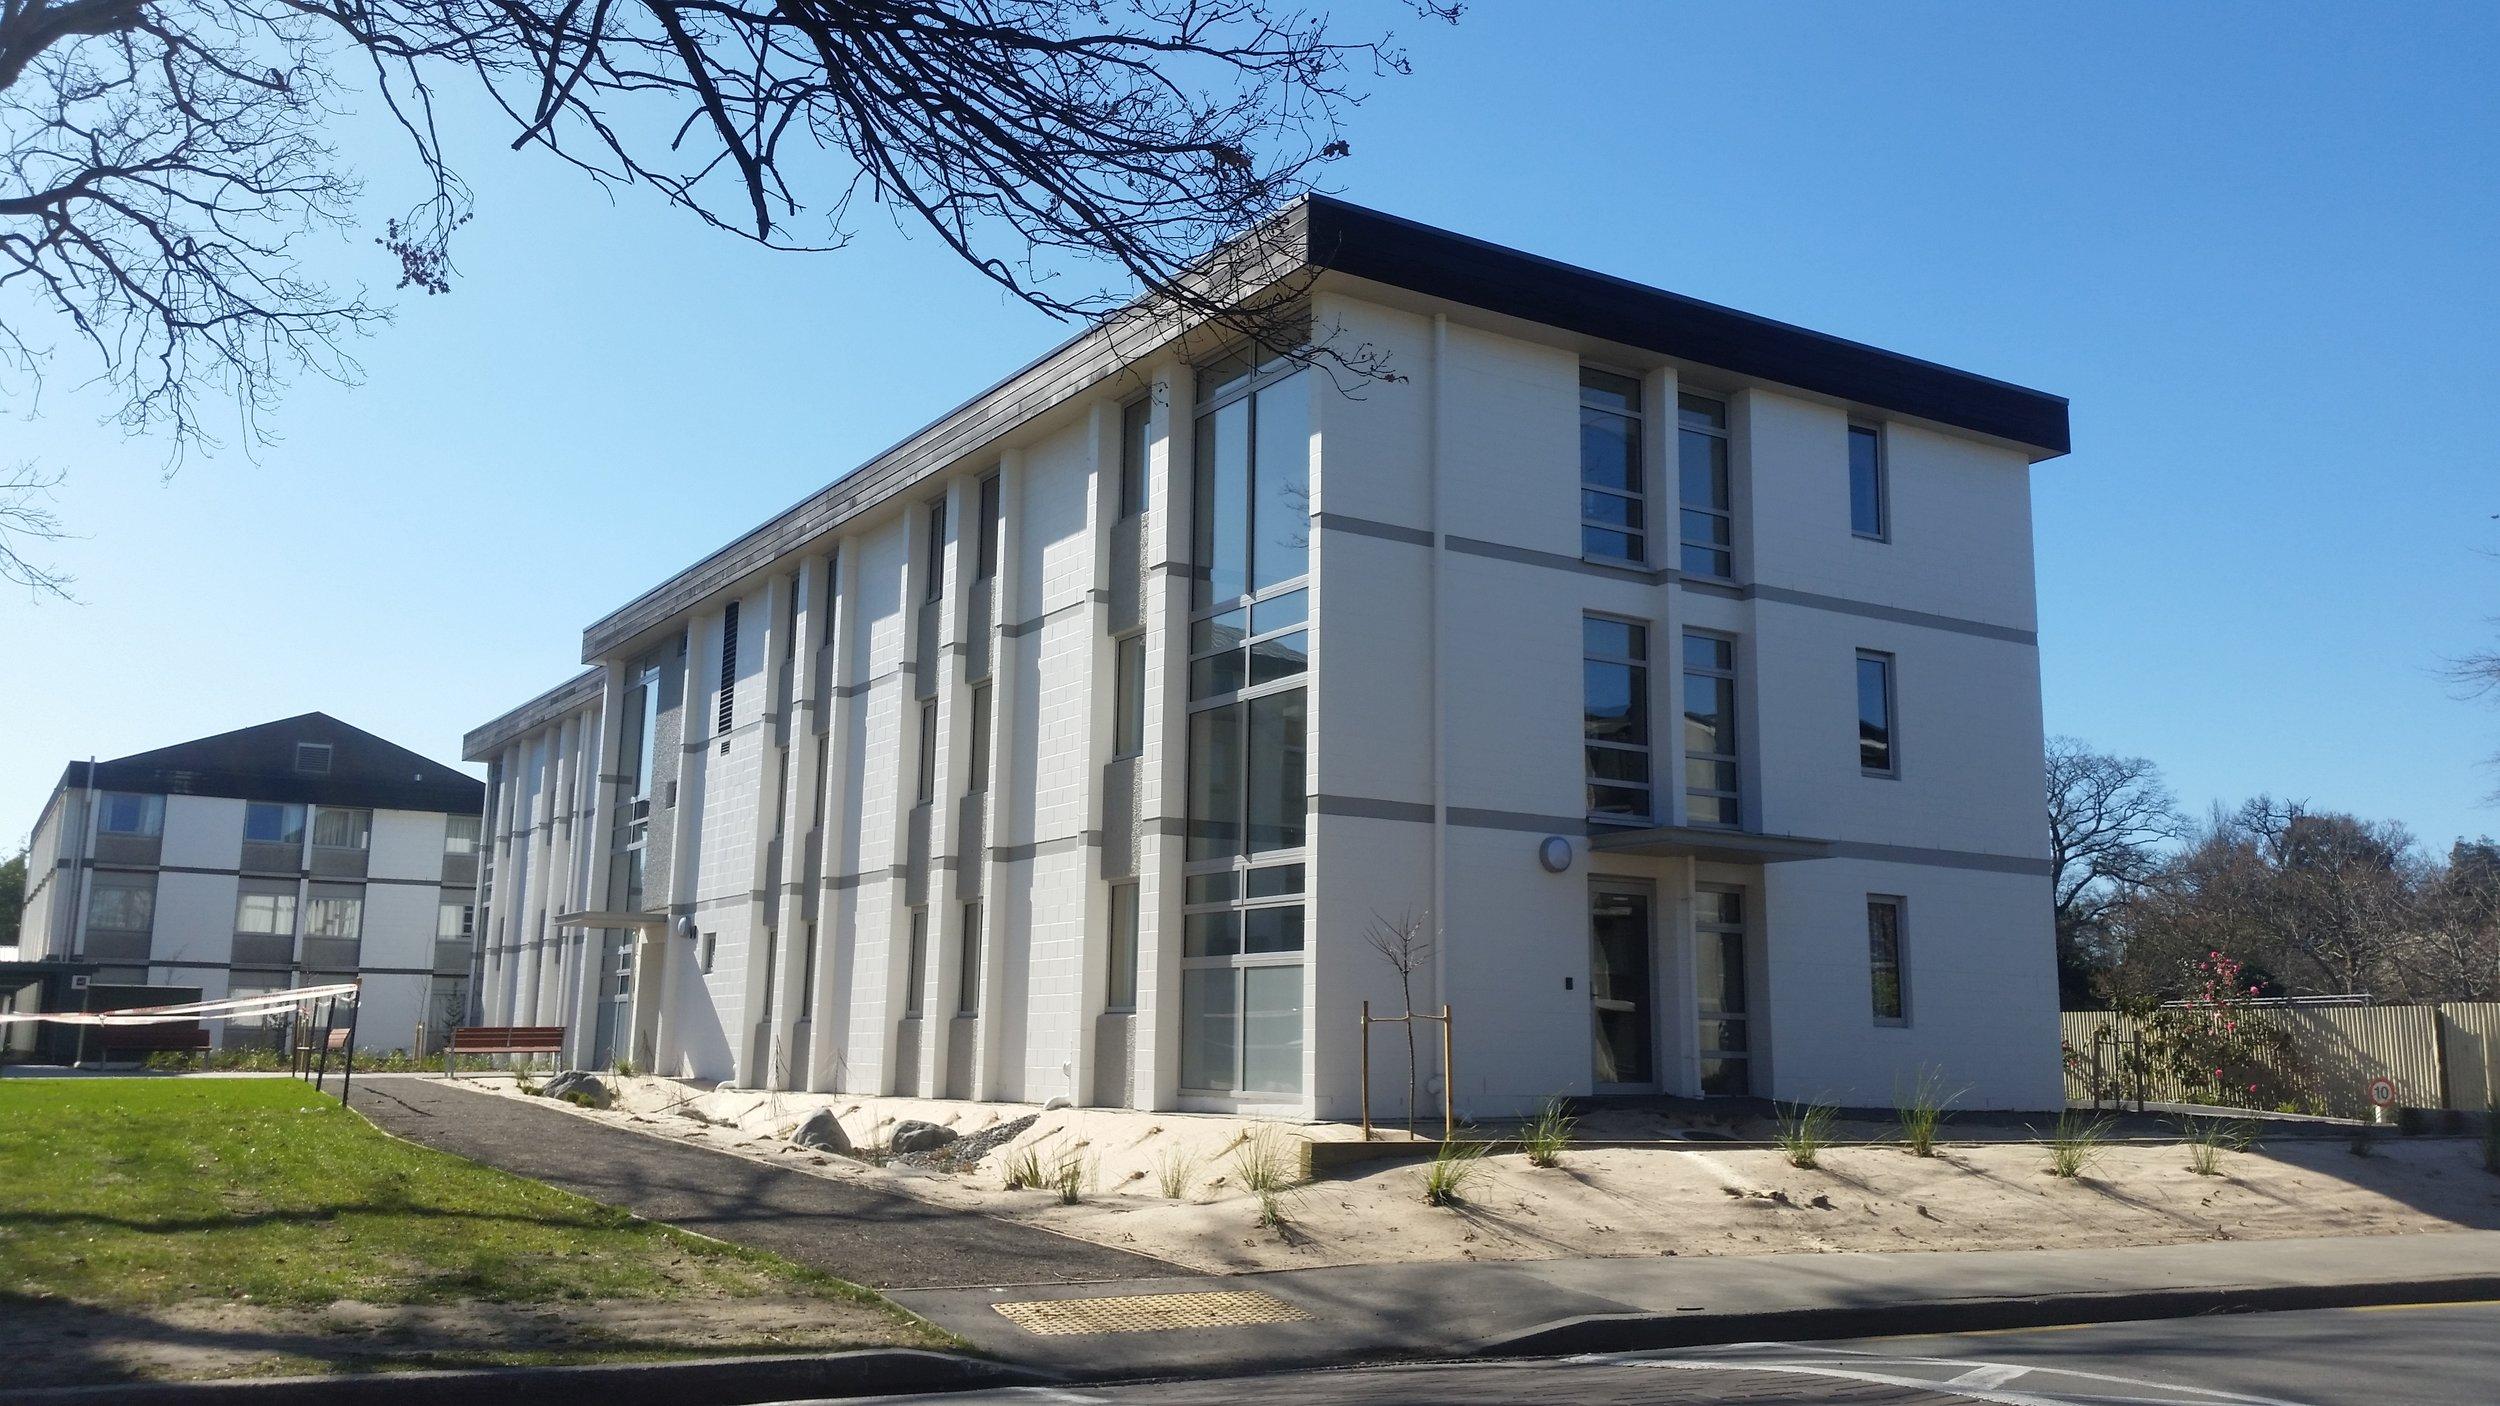 Bishop Julius New Accommodation Block & Miscellaneous Seismic Strengthening, University of Canterbury, Christchurch